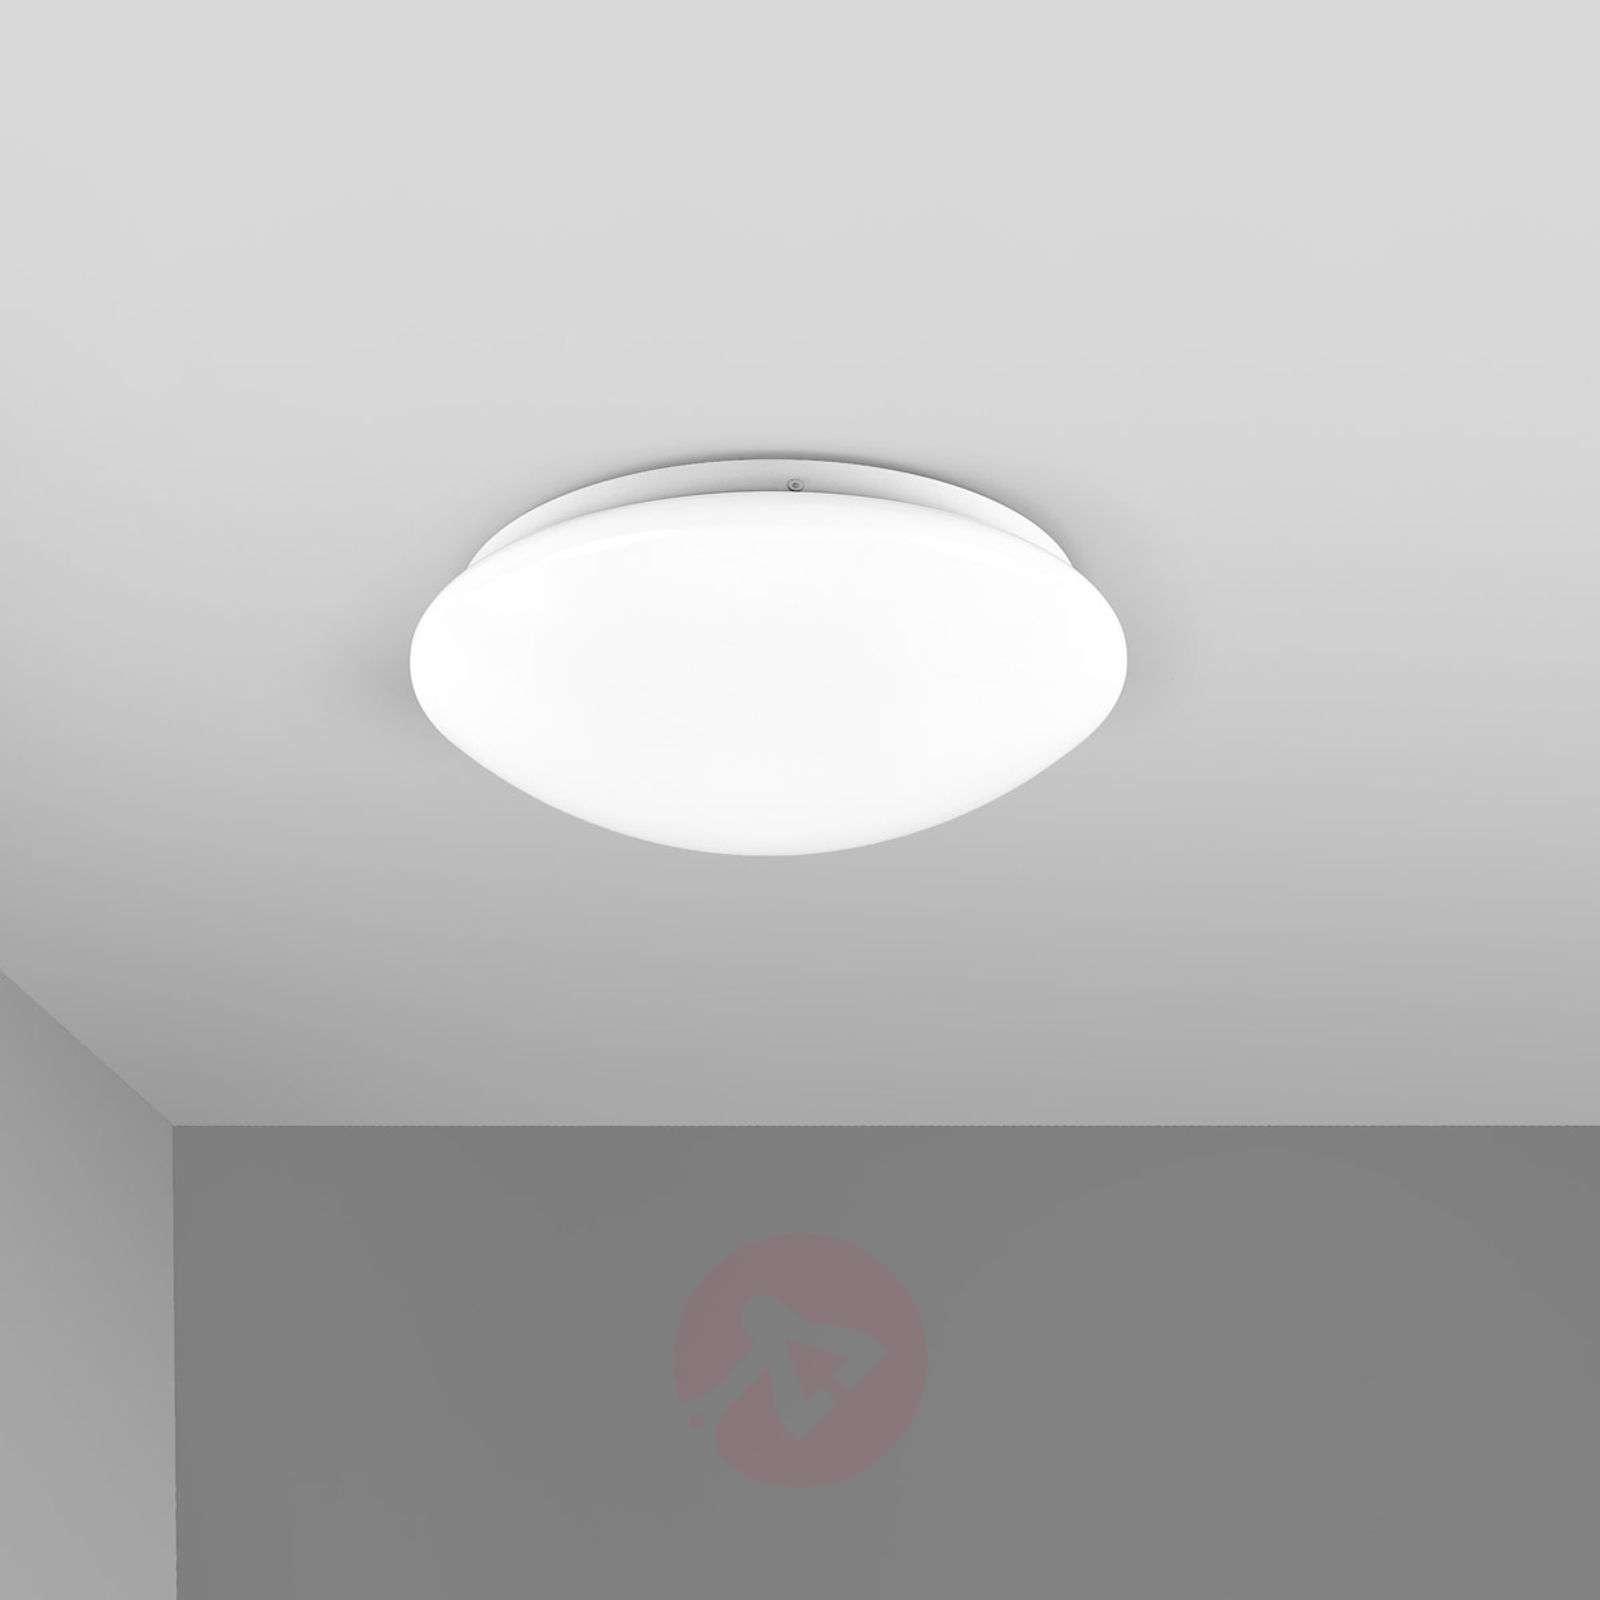 Simple LED bathroom ceiling lamp Selveta, 30 cm-9945030-01